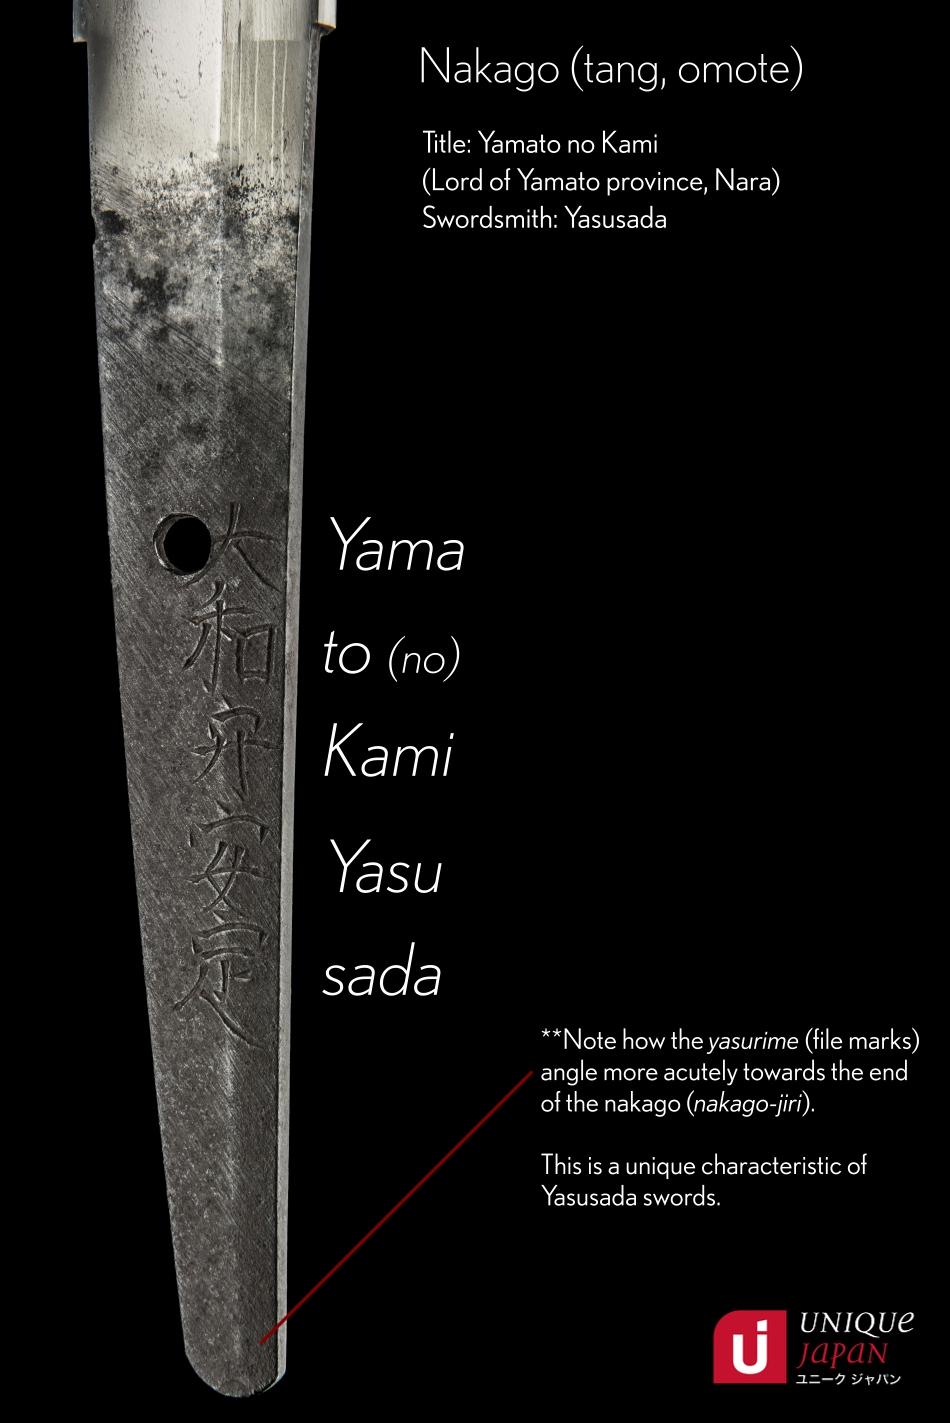 Yamato no Kami Yasusada Wakizashi Nakago